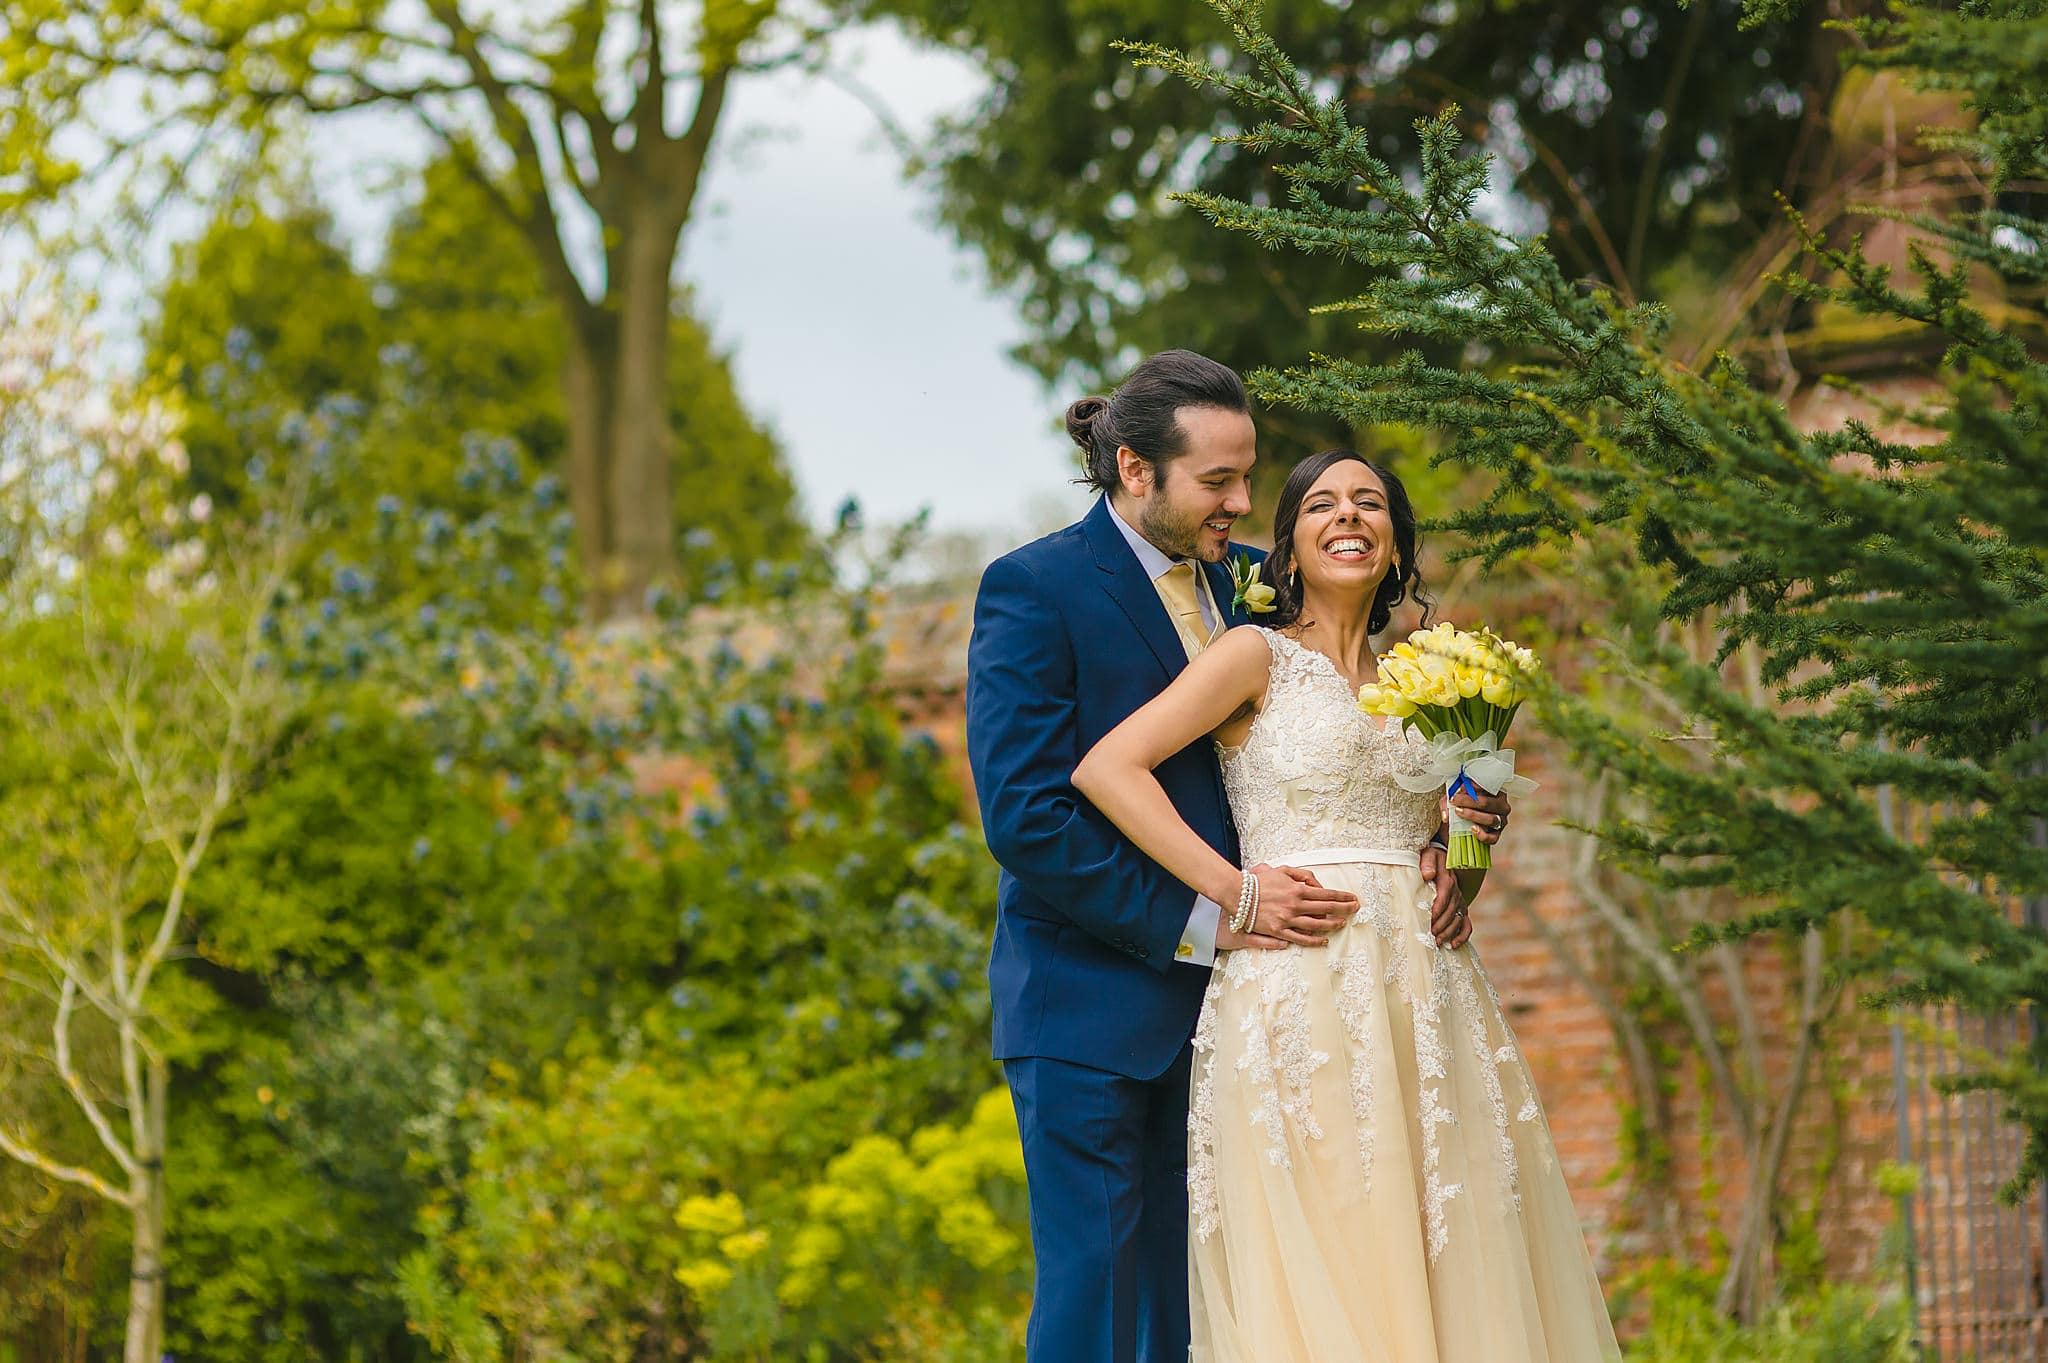 Sheena + Lee | Birtsmorton Court Wedding 73